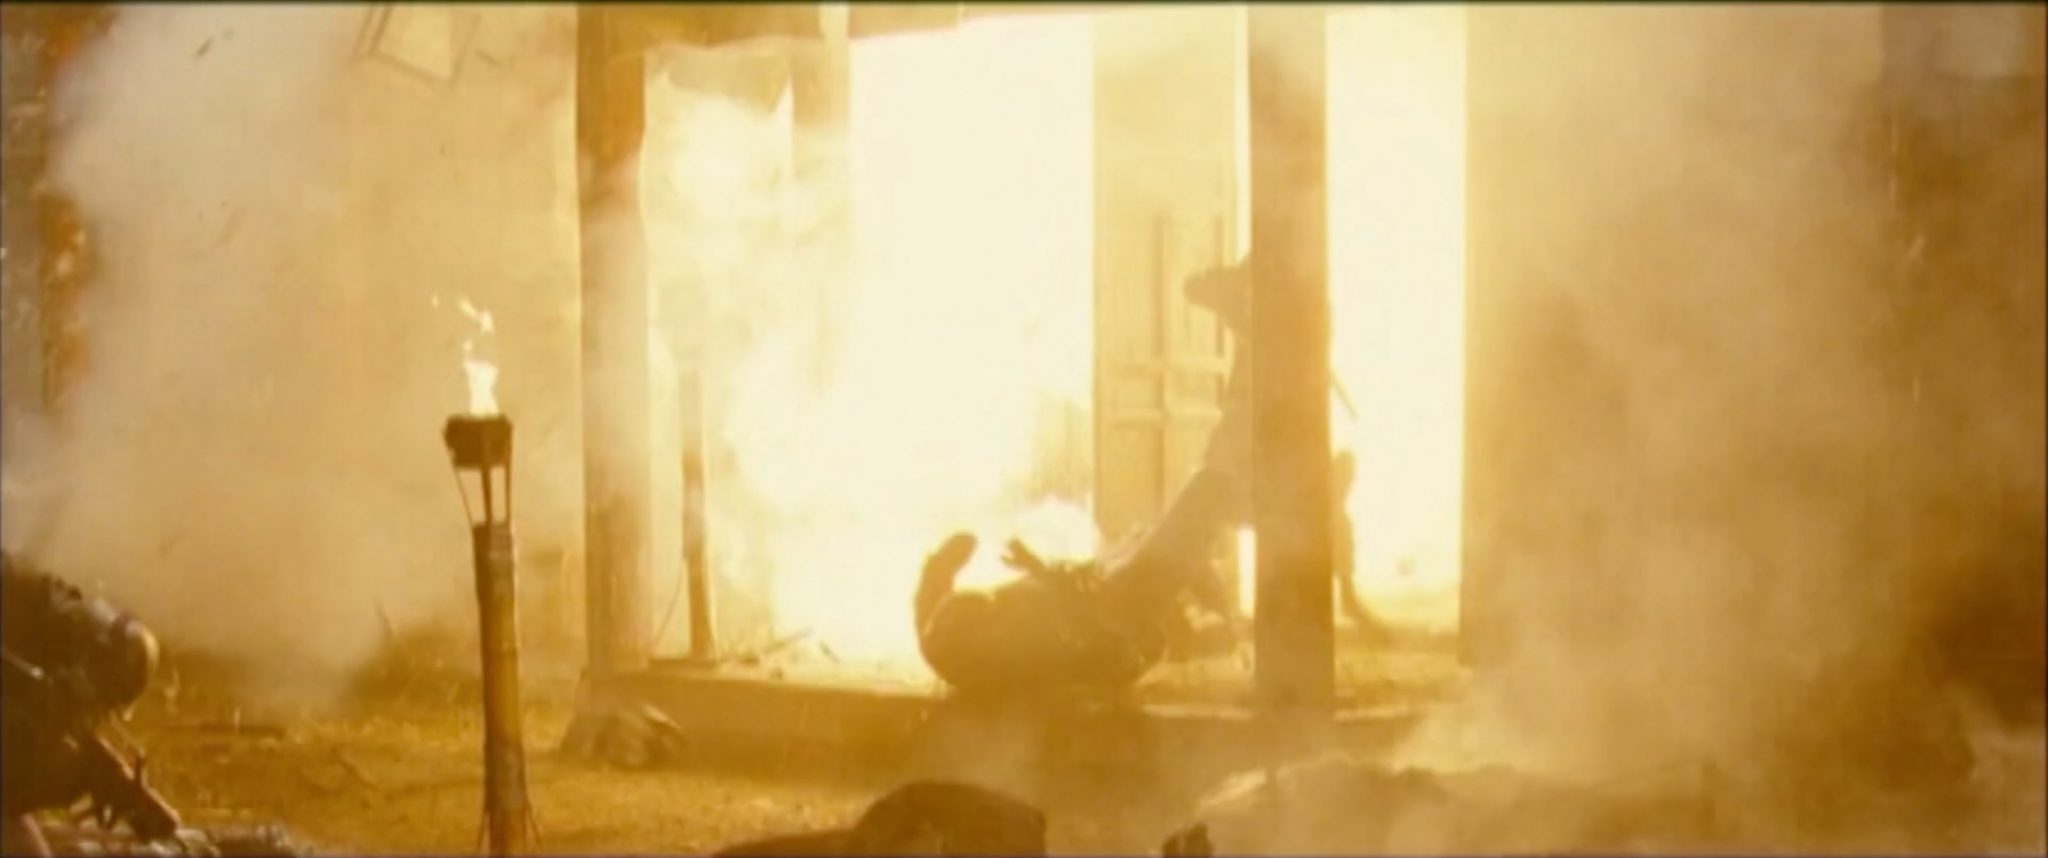 MG Action, Martin Goeres, Ninja Assassin, Stunt, Explosion, Fire, Movie